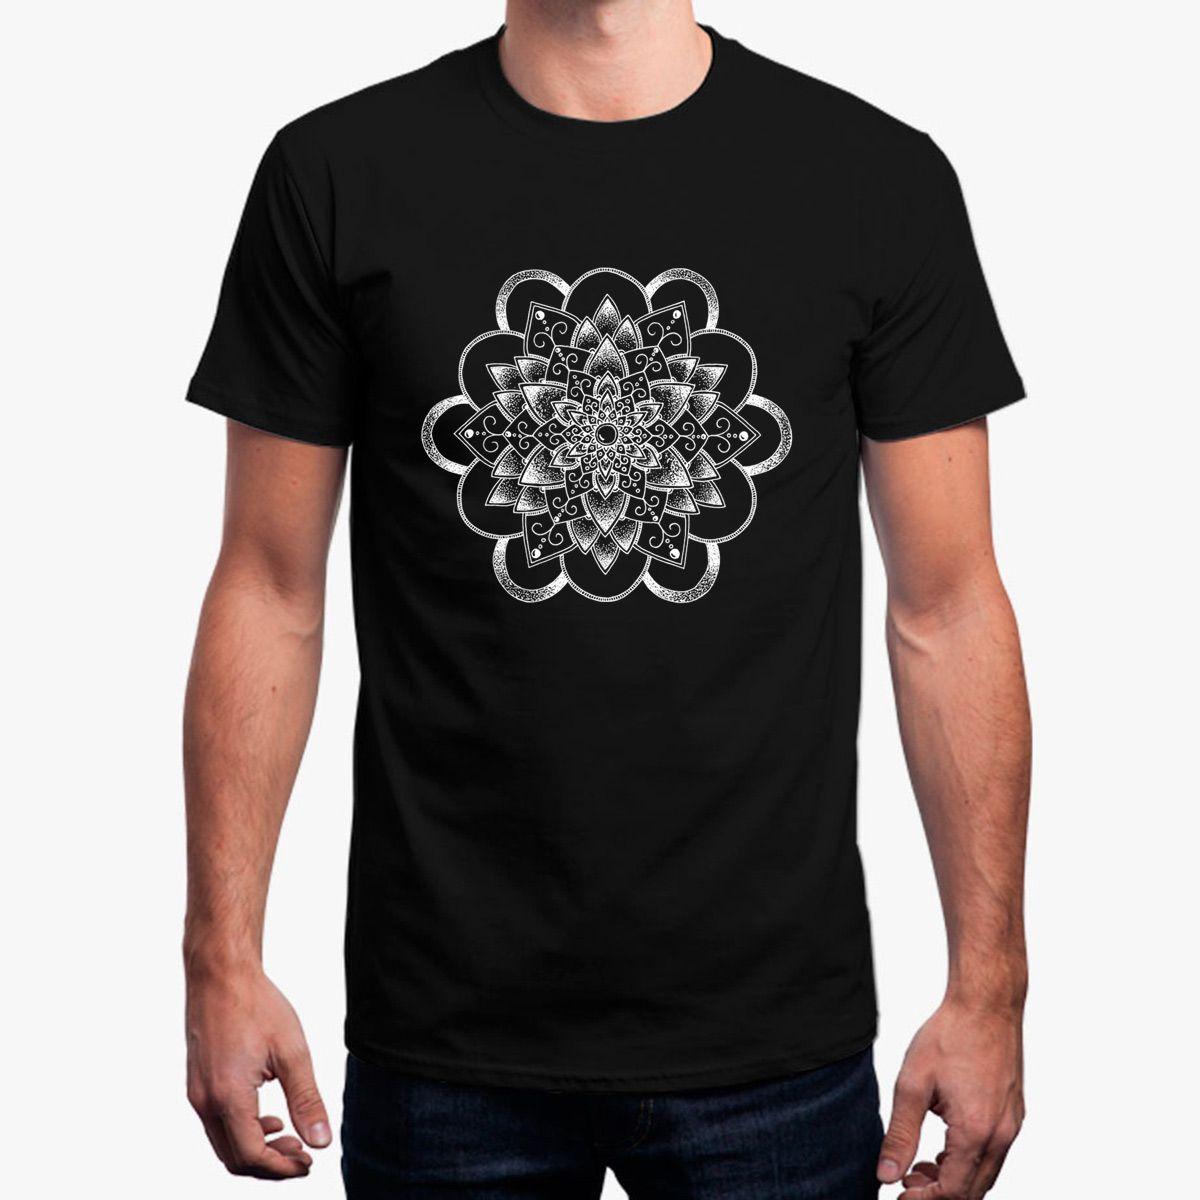 5e518231eae New Tshirt For Men Dahlia Mandala Clothing T Shirt Mens Cotton Cool Male  Men S T Shirt Plus Size 3xl Tops Crea Tu Camiseta Design Your Own T Shirts  Womens ...